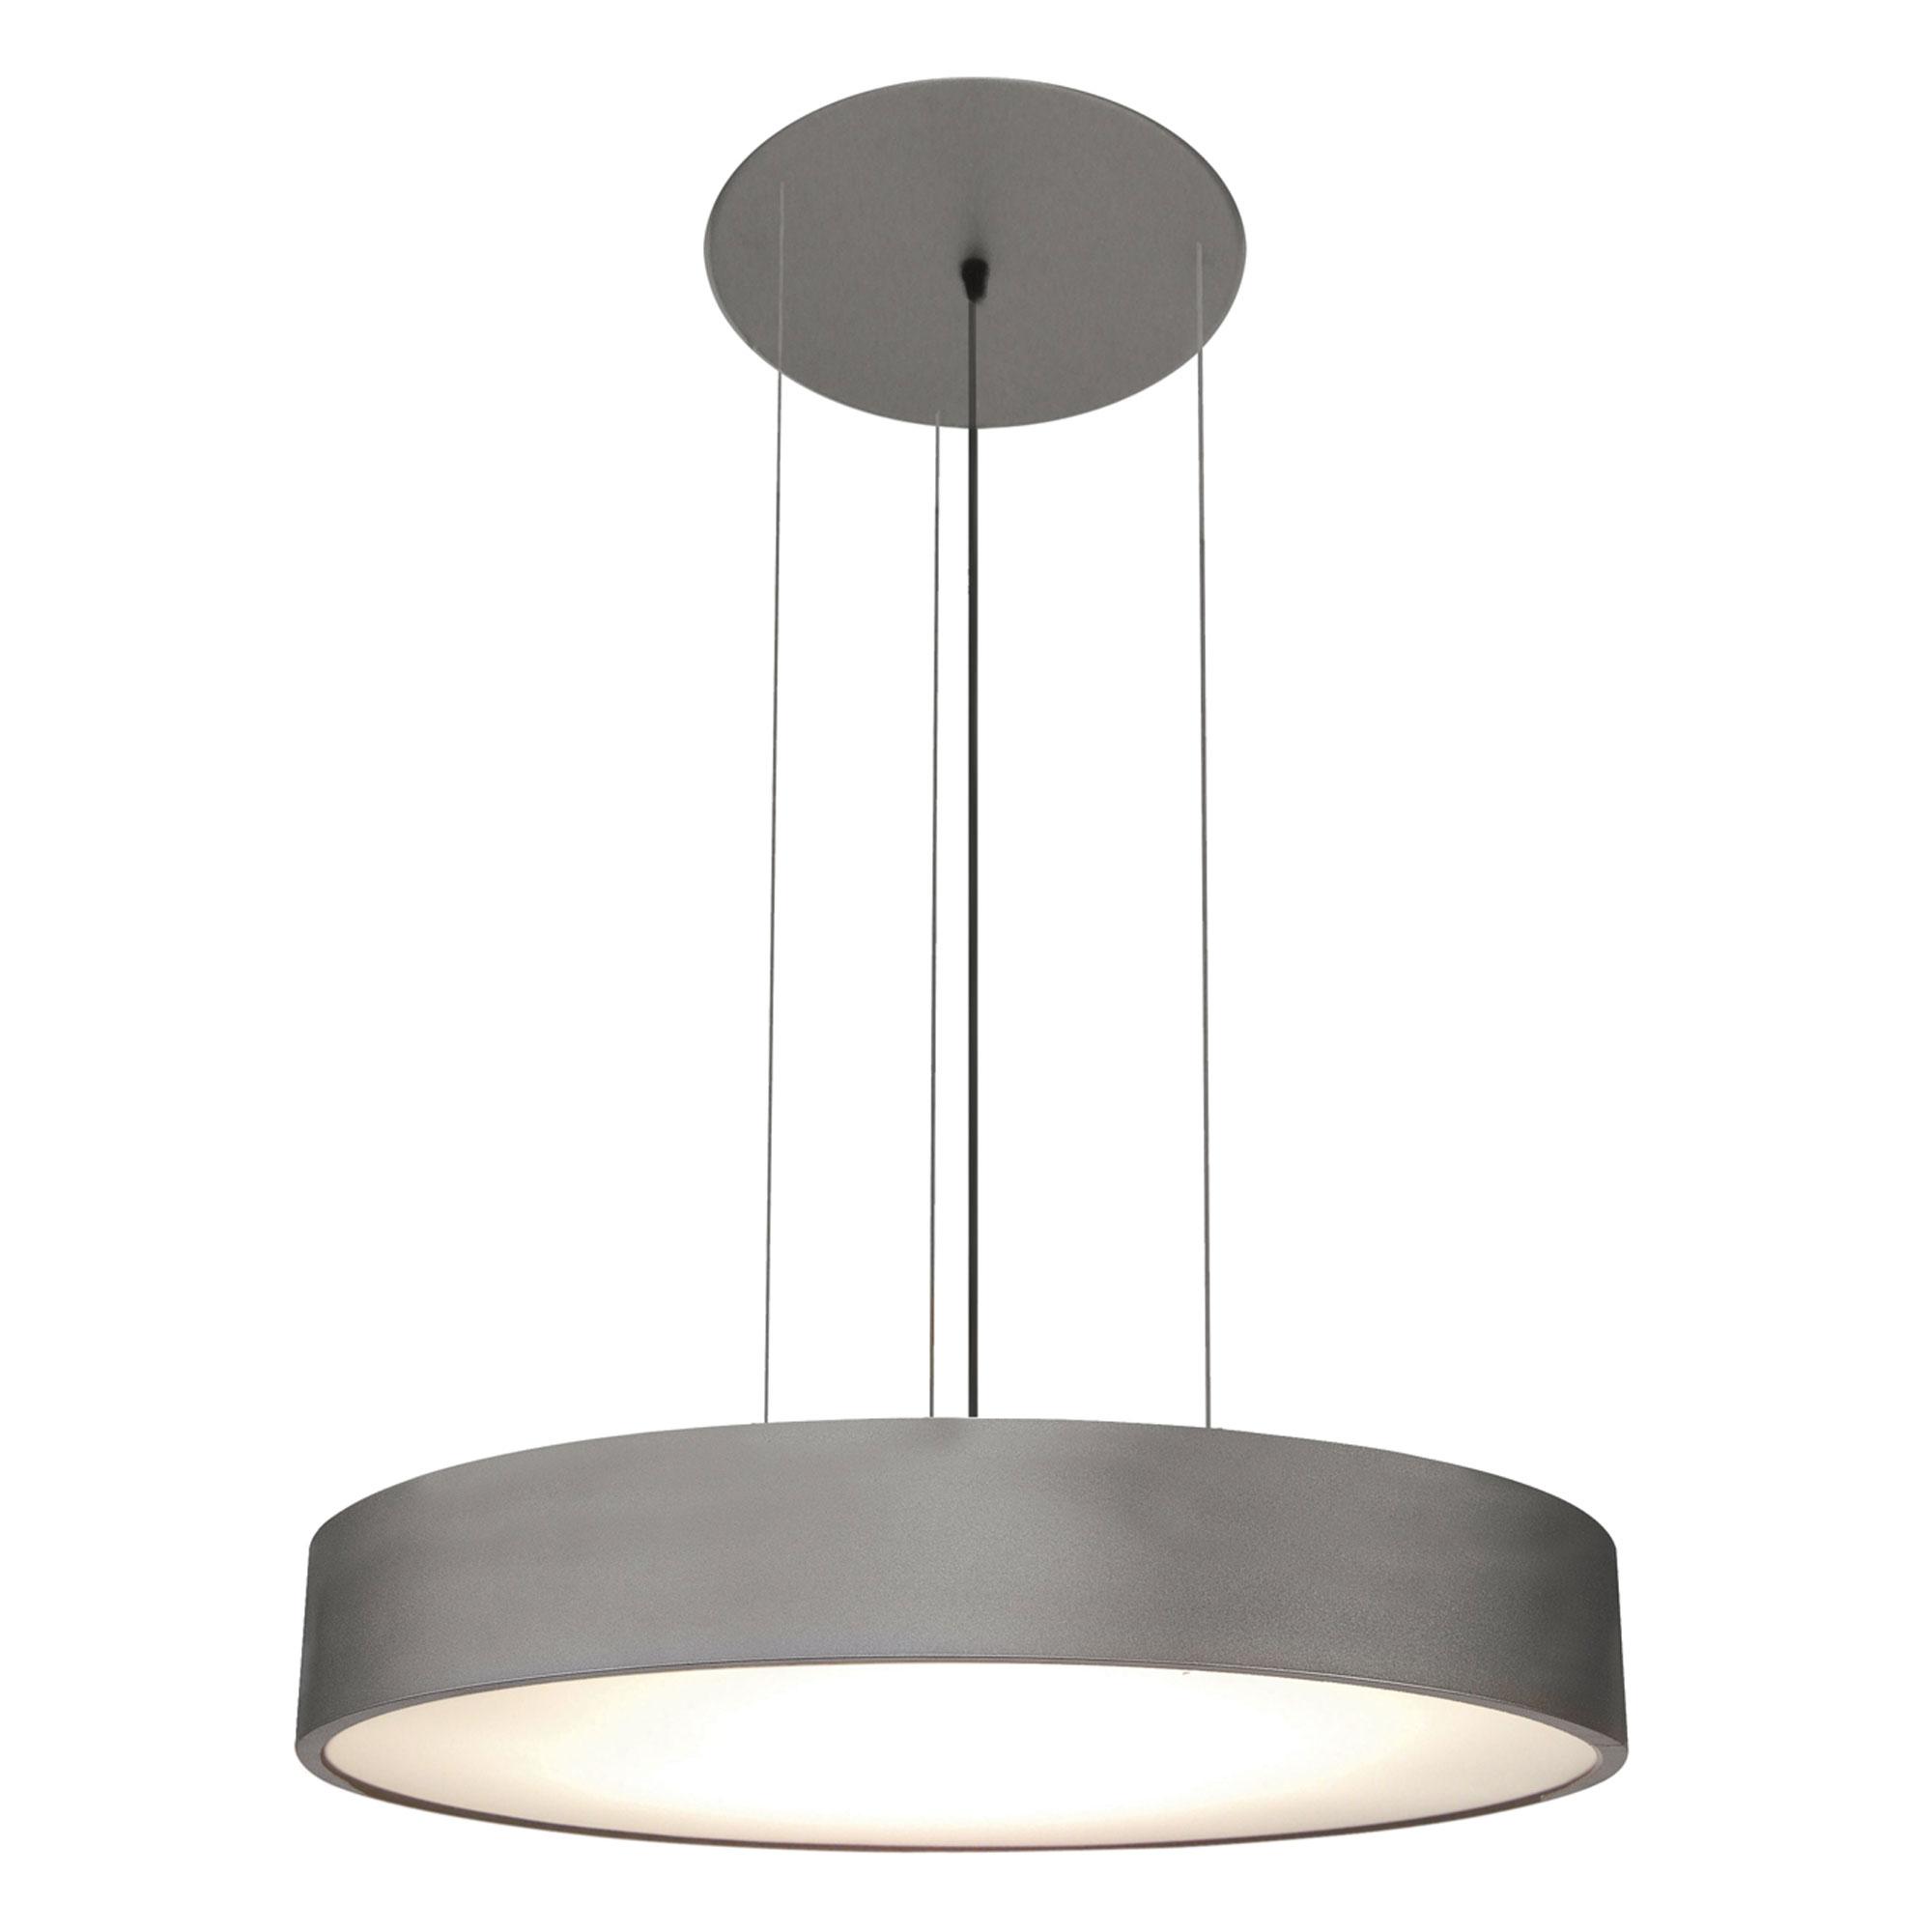 round light fixture chrome vega round suspension by pureedge lighting vegardh1si